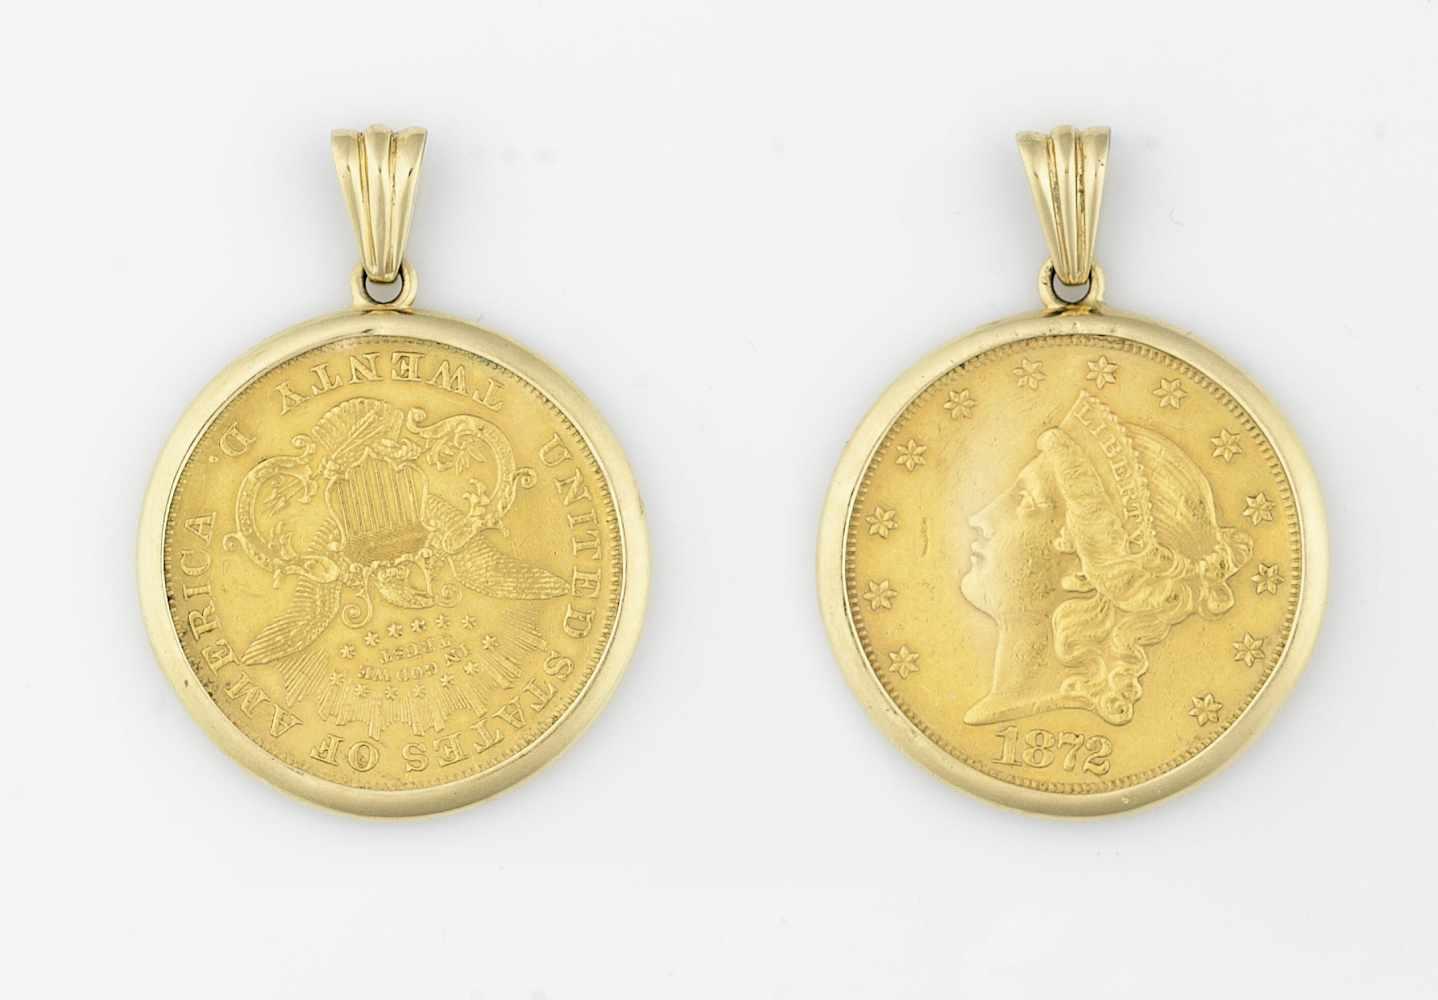 USA 20 Dollar Liberty GoldmünzanhängerGold 900 und 750, 1872, 37,7g